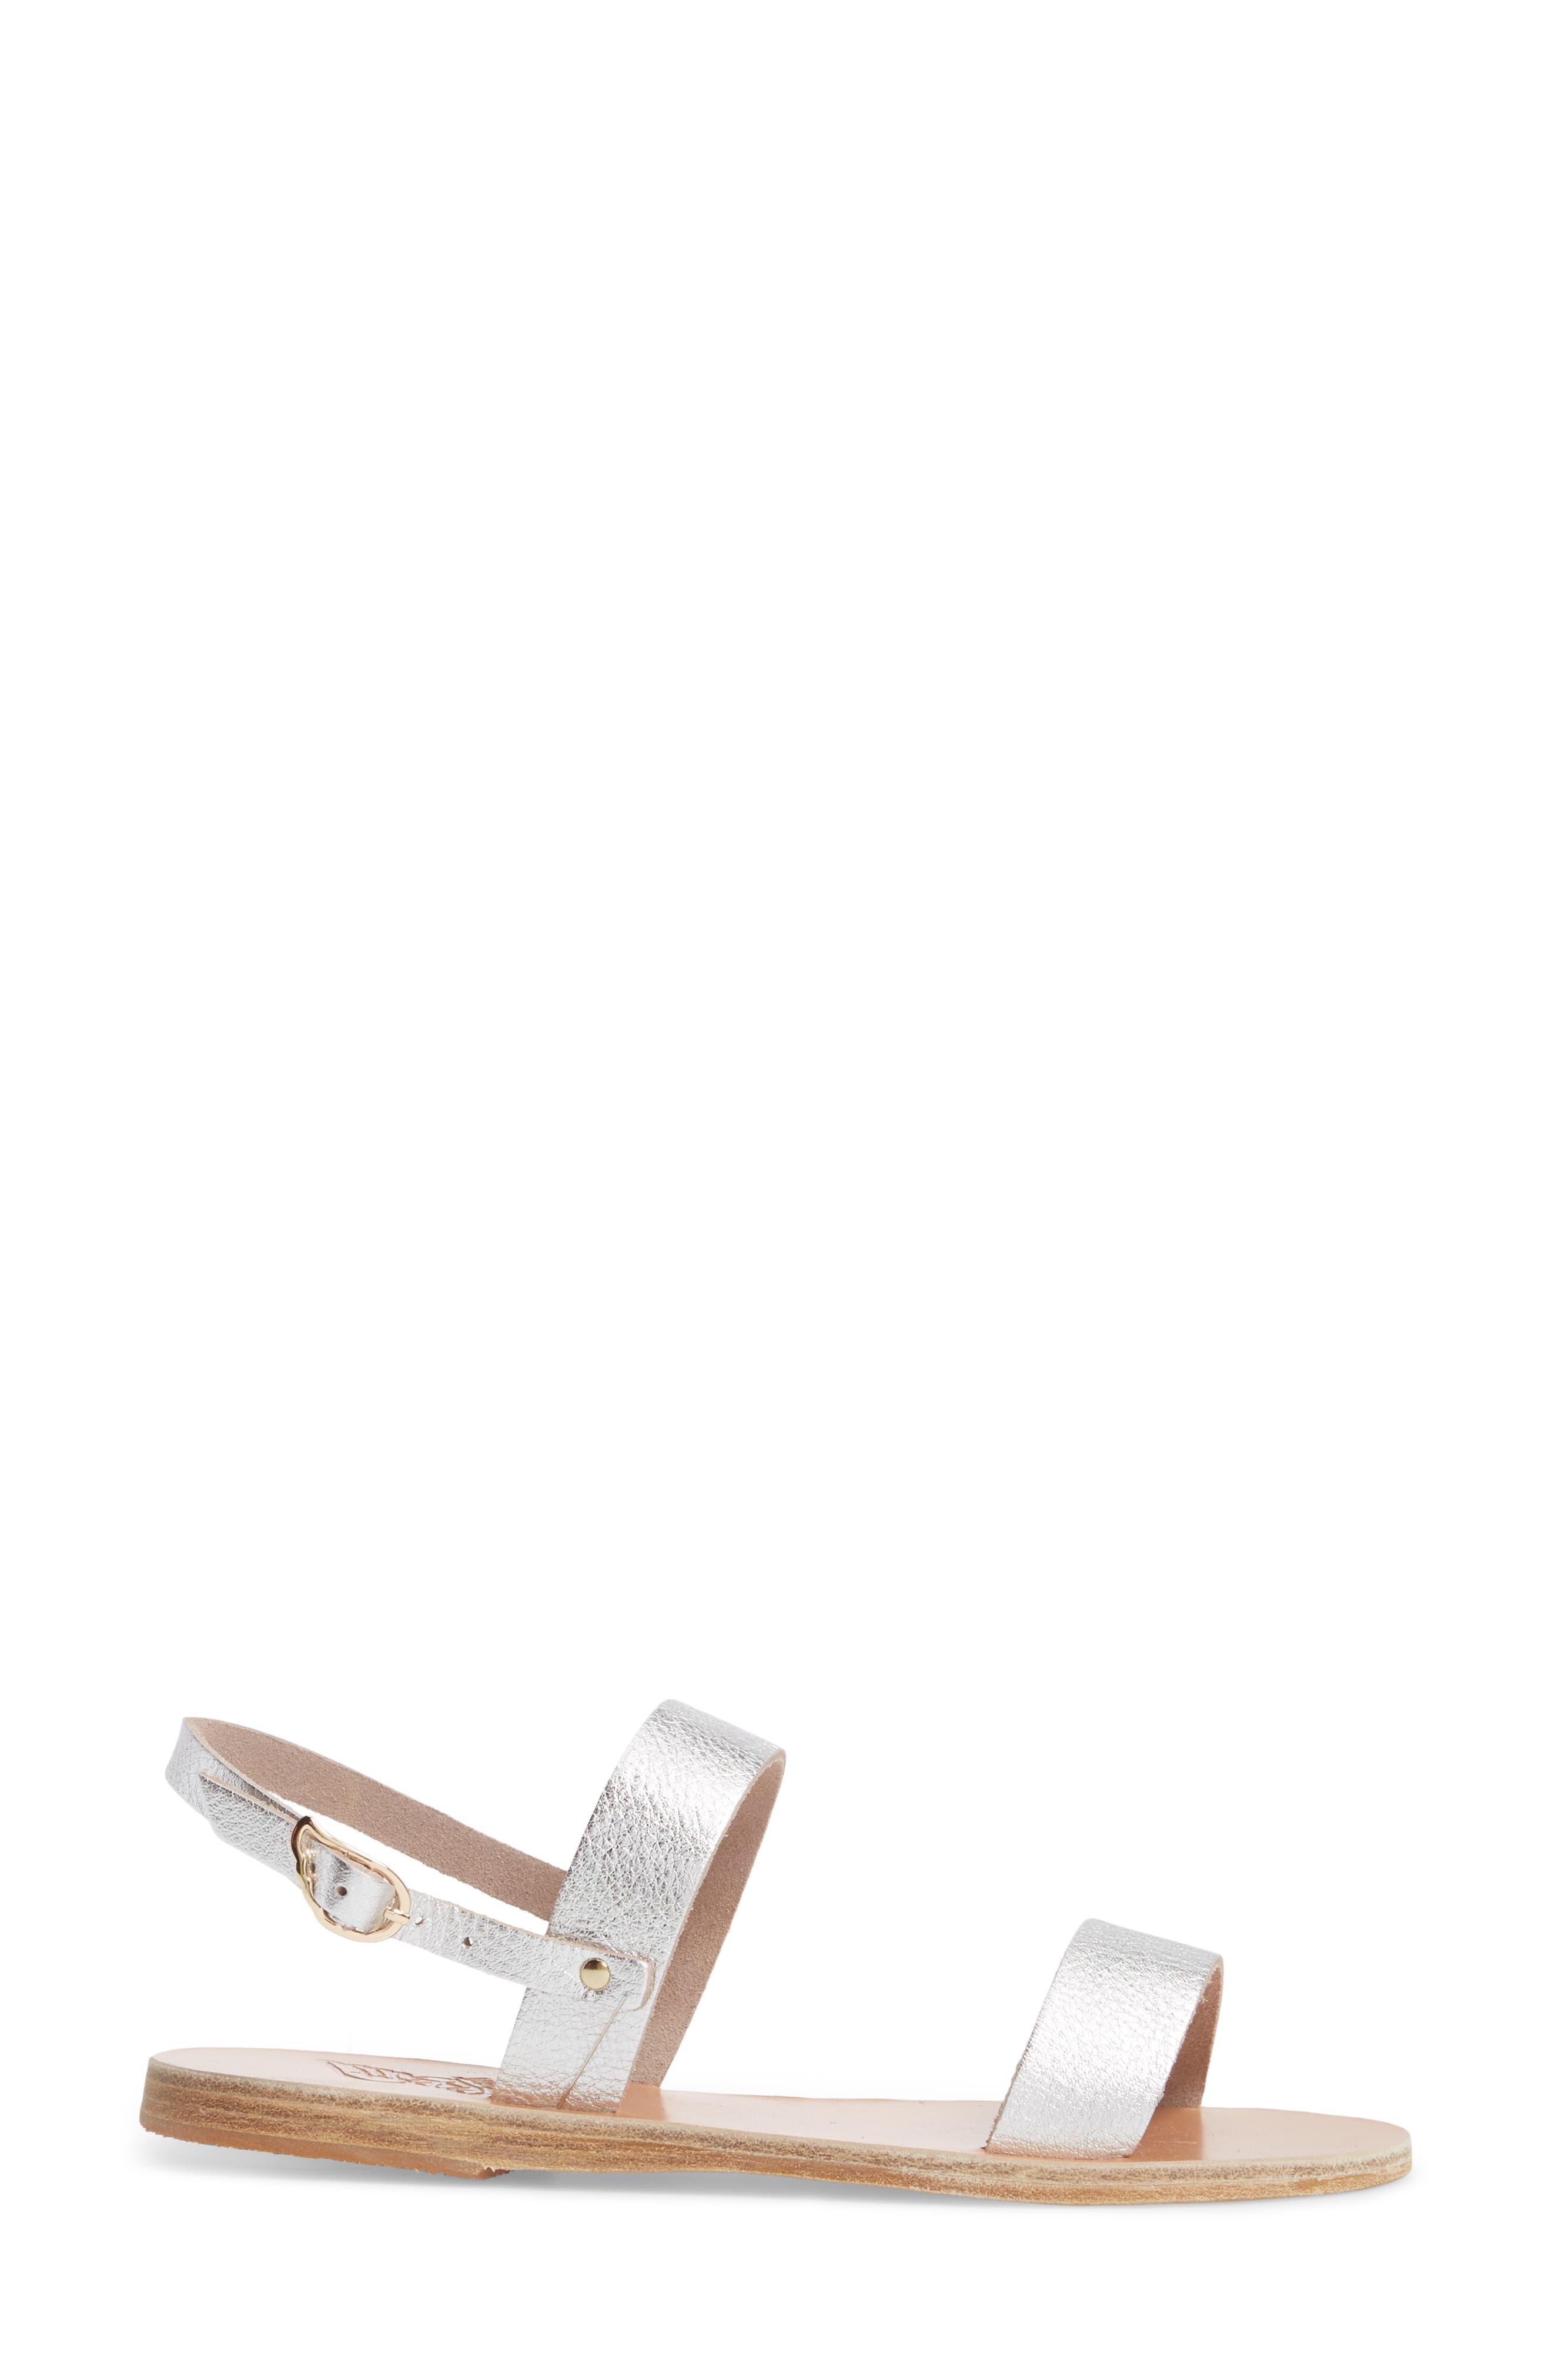 Clio Slingback Sandal,                             Alternate thumbnail 3, color,                             041